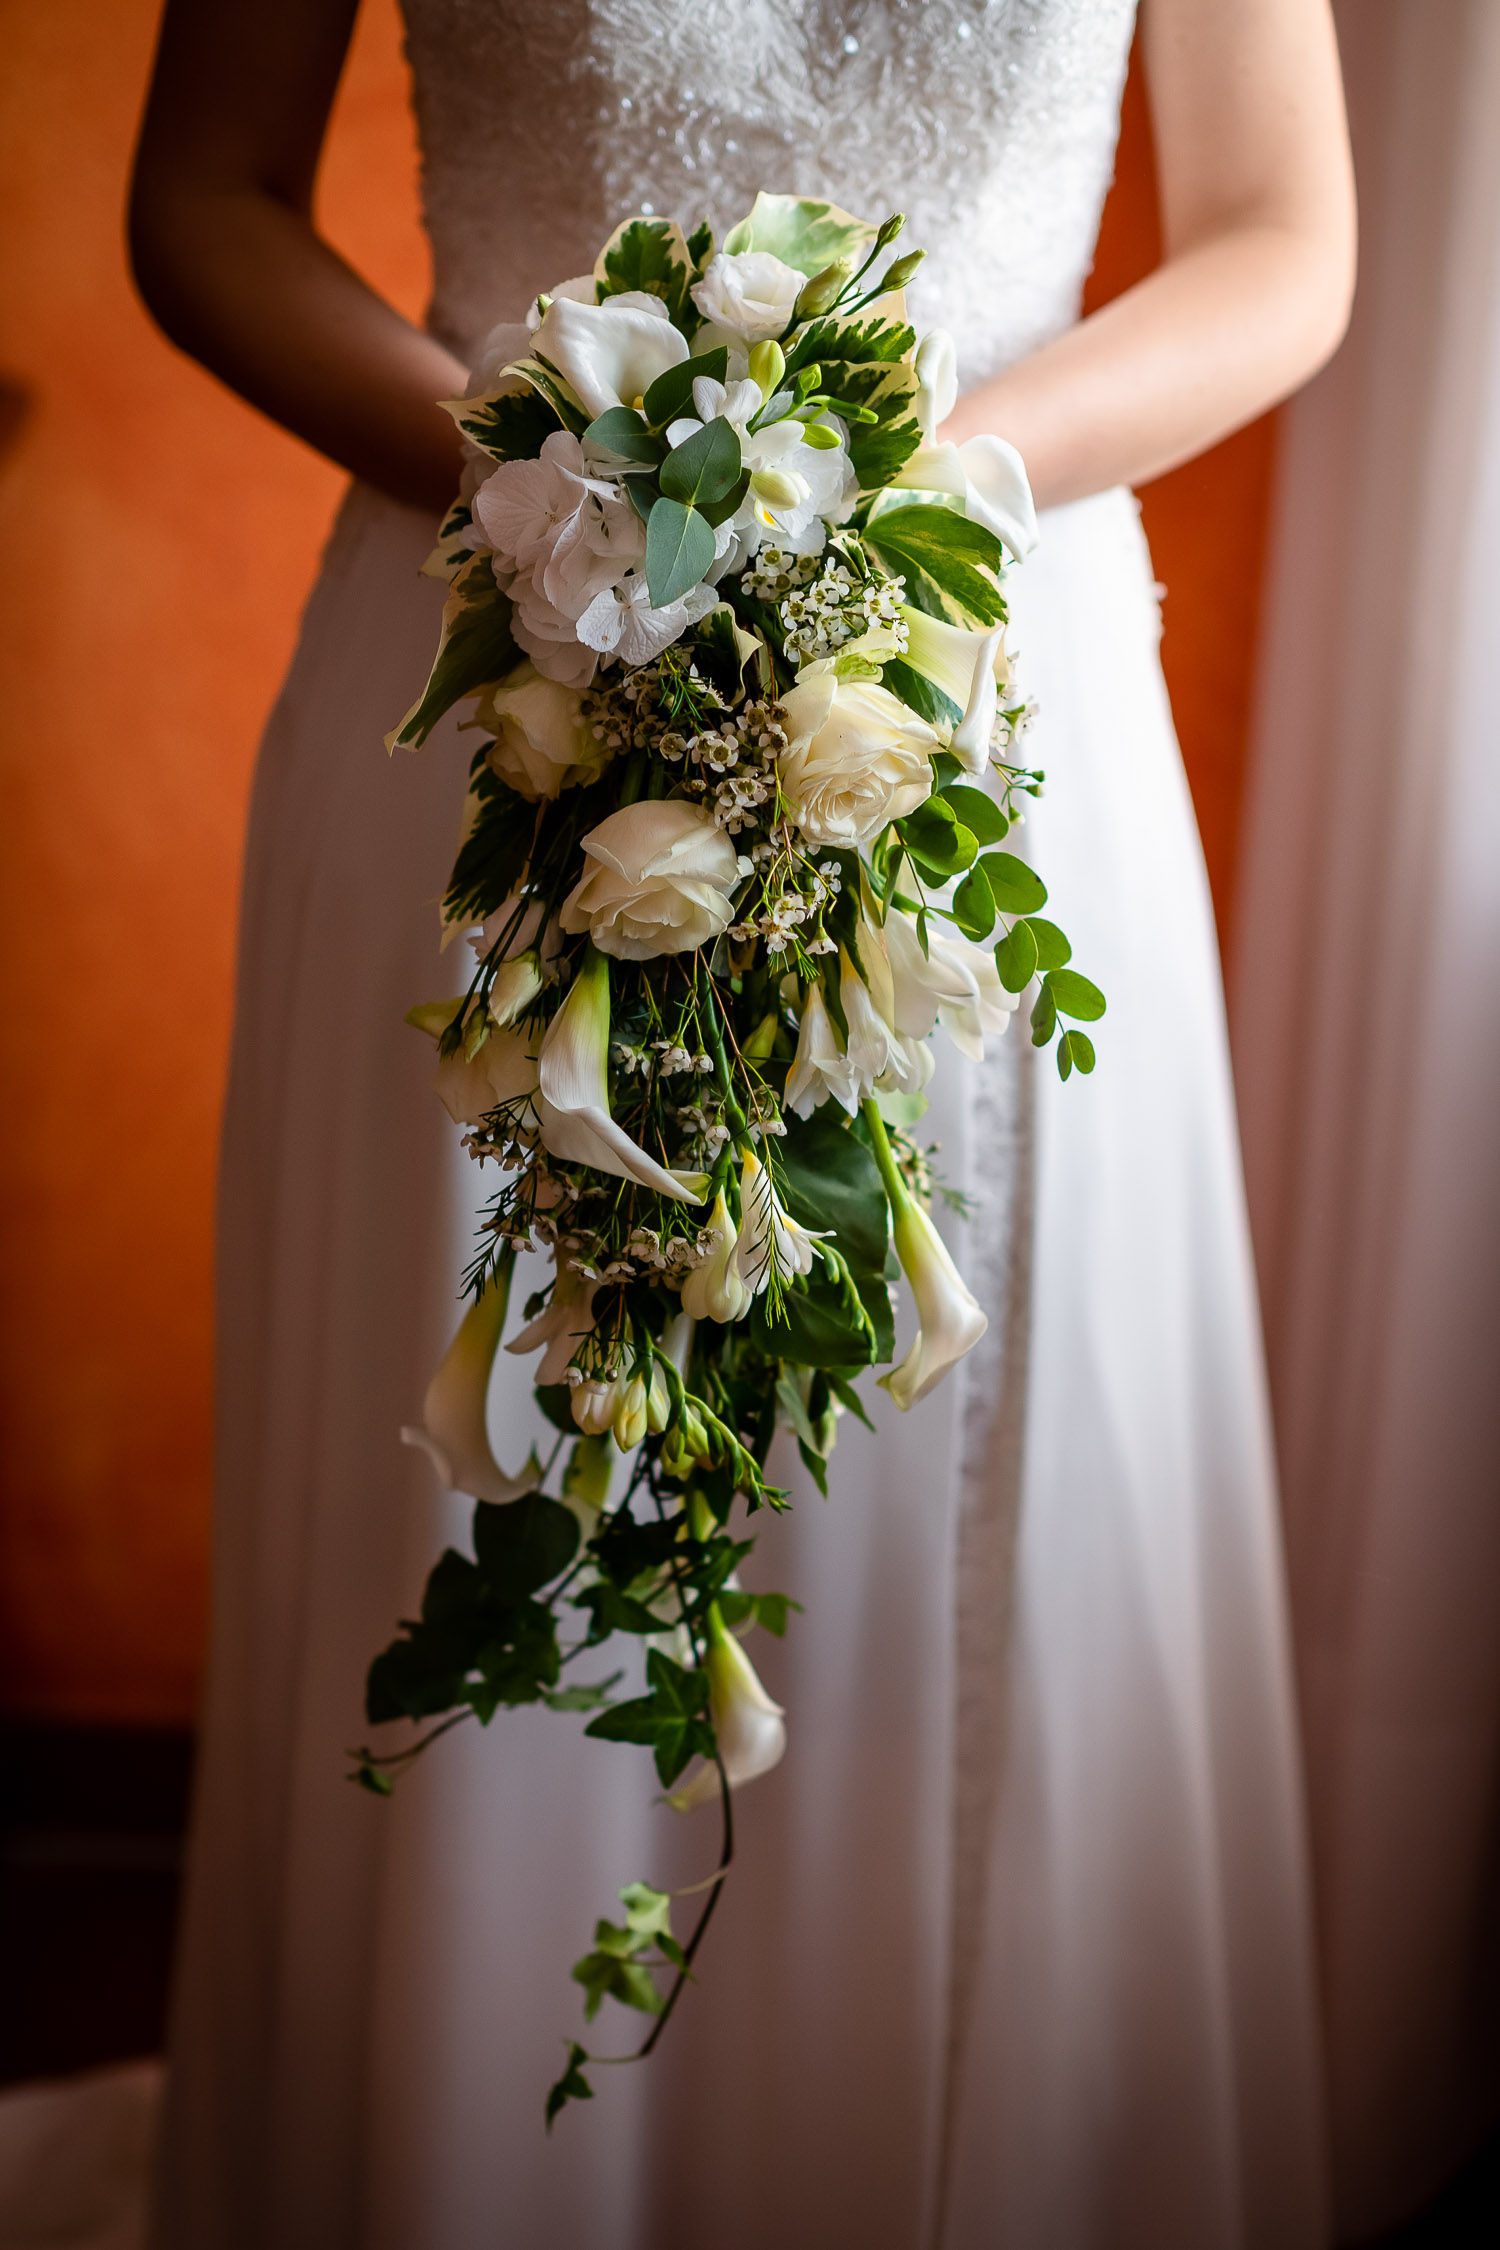 PAOLO-MANTOVAN-FOTOGRAFIA-ROMANTIC-WEDDING-IN-PIEMONTE-ADRIANA-E-LUCA-MAISON-VERTE-36